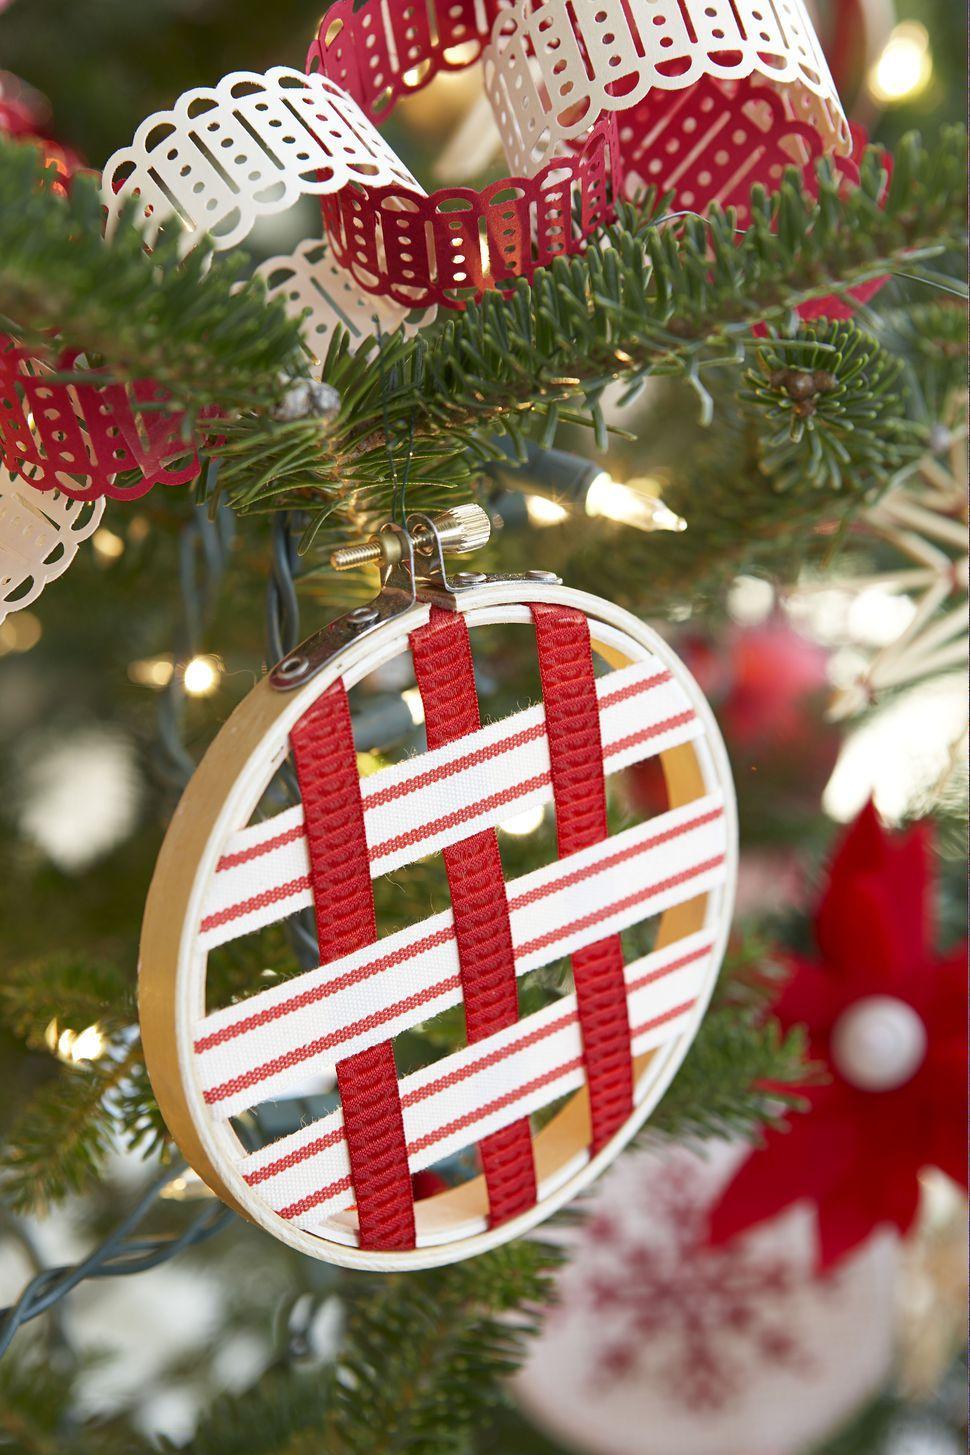 10 ScandinavianInspired Christmas Decorating Ideas